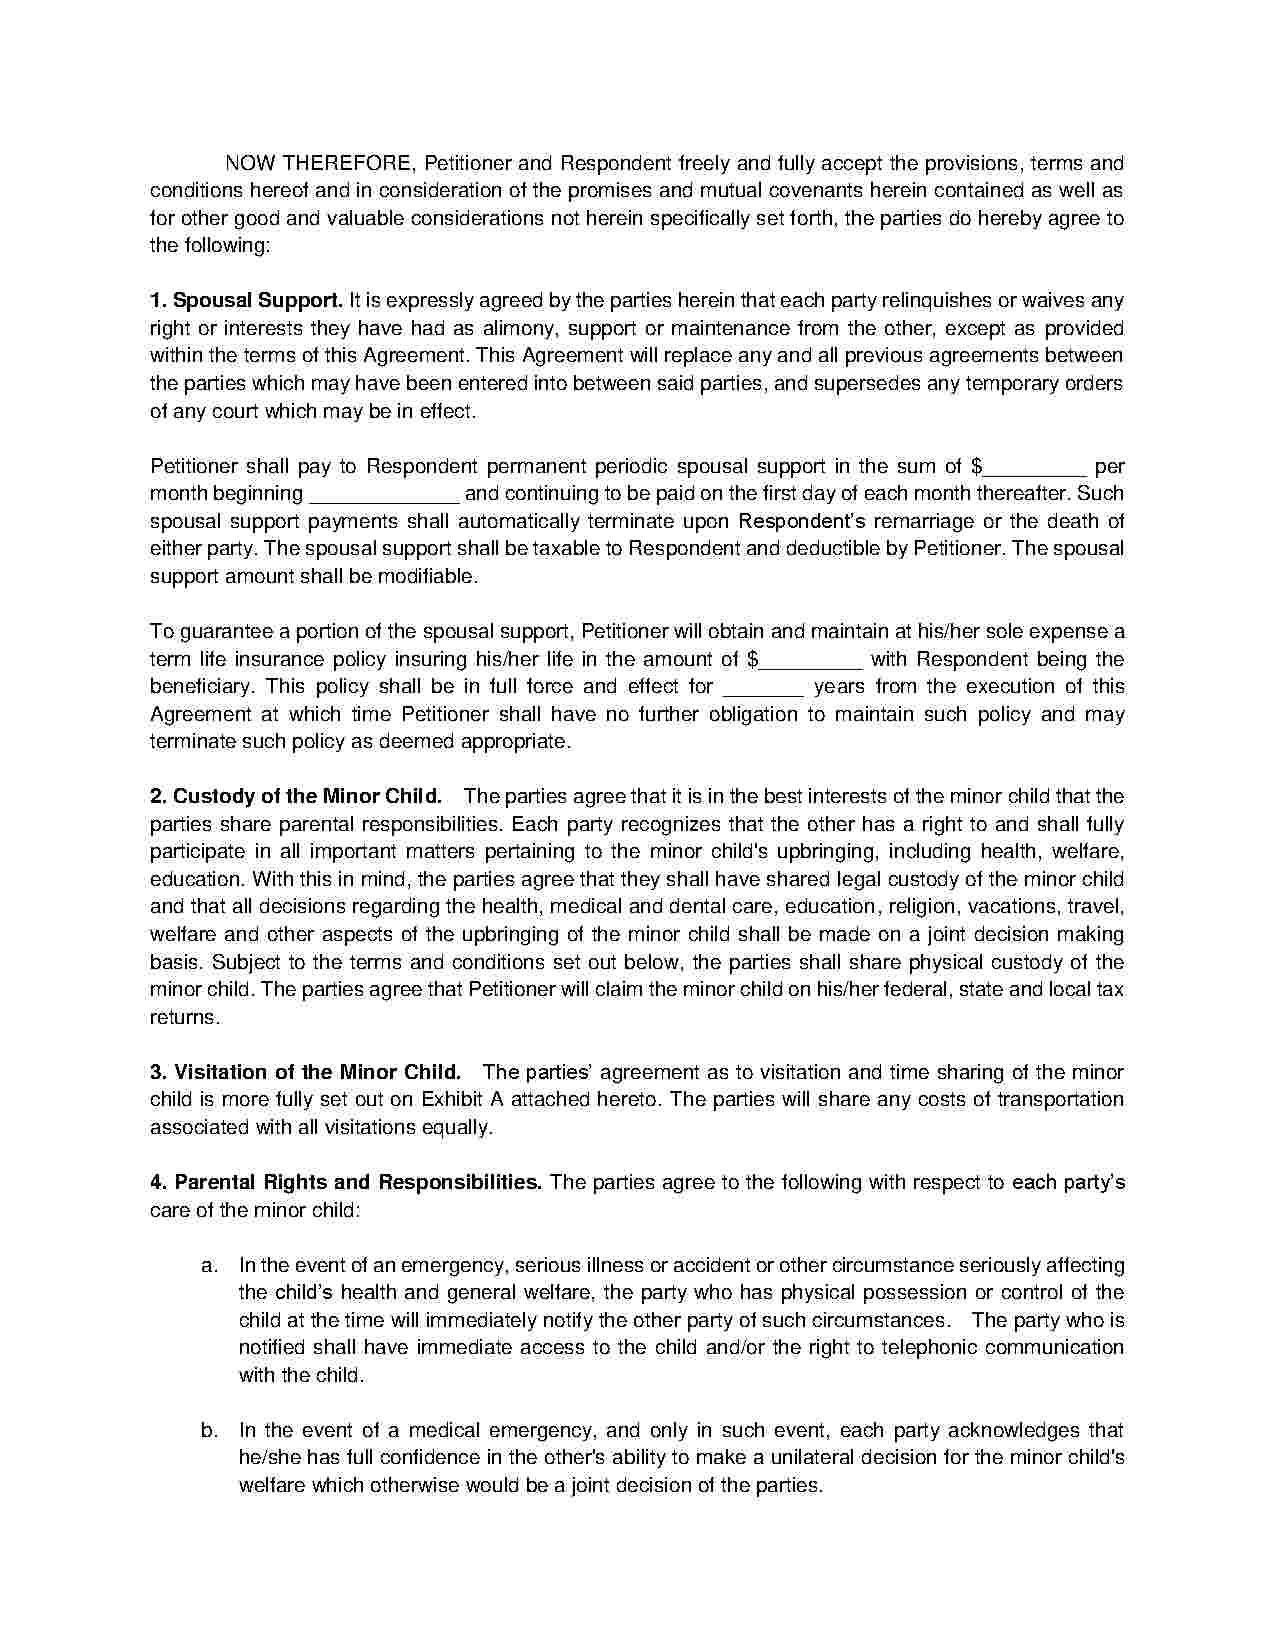 Separation Agreement Separation Agreement Template Separation Agreement Divorce Mediation